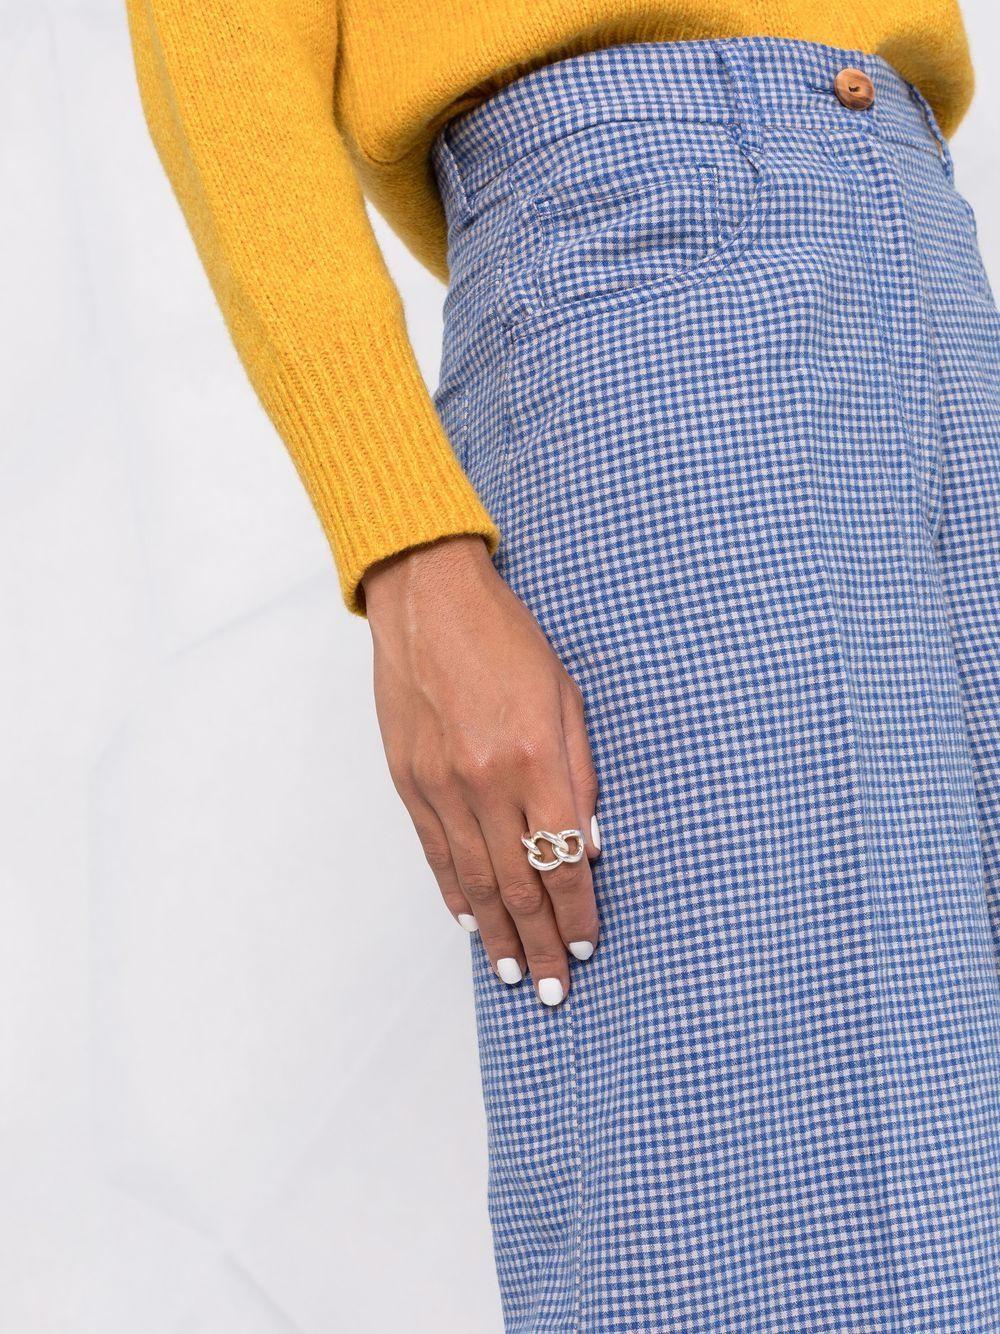 Pantaloni blu a quadri in lana vergine a gamba larga FORTE_FORTE | Pantaloni | 8638FIORDALISO